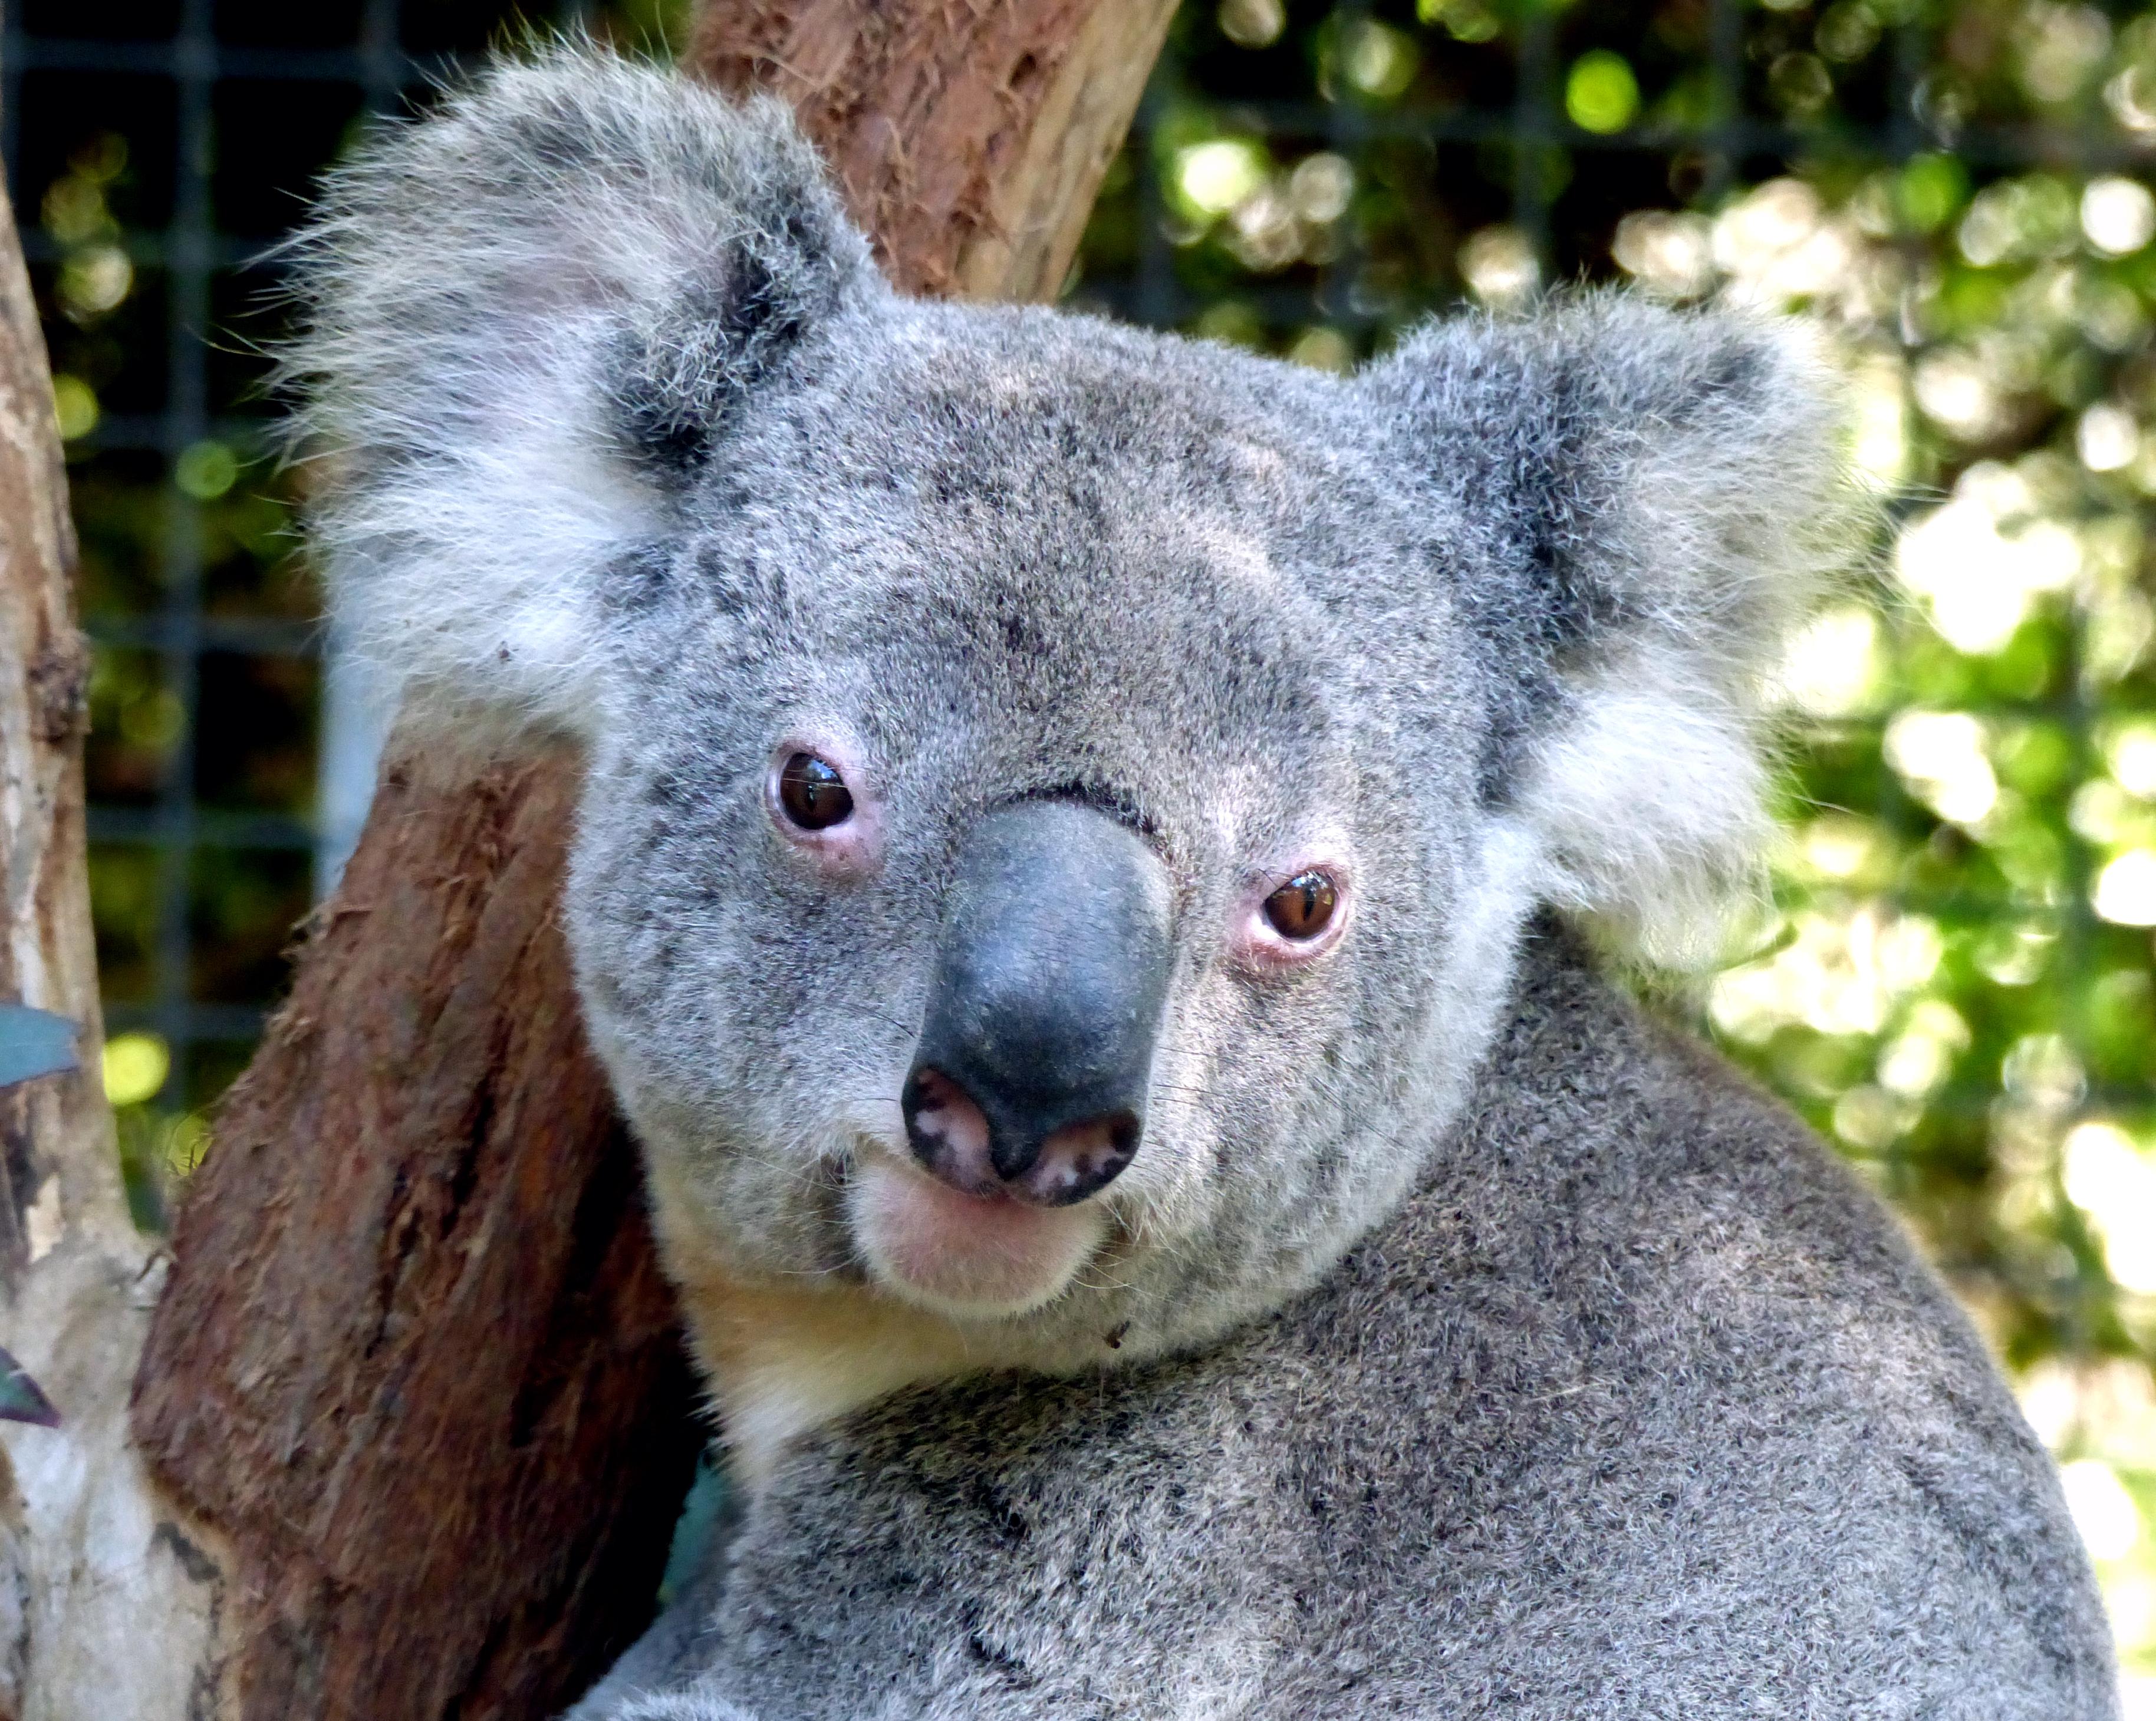 Koala.birdland animal park batemans bay nsw. photo